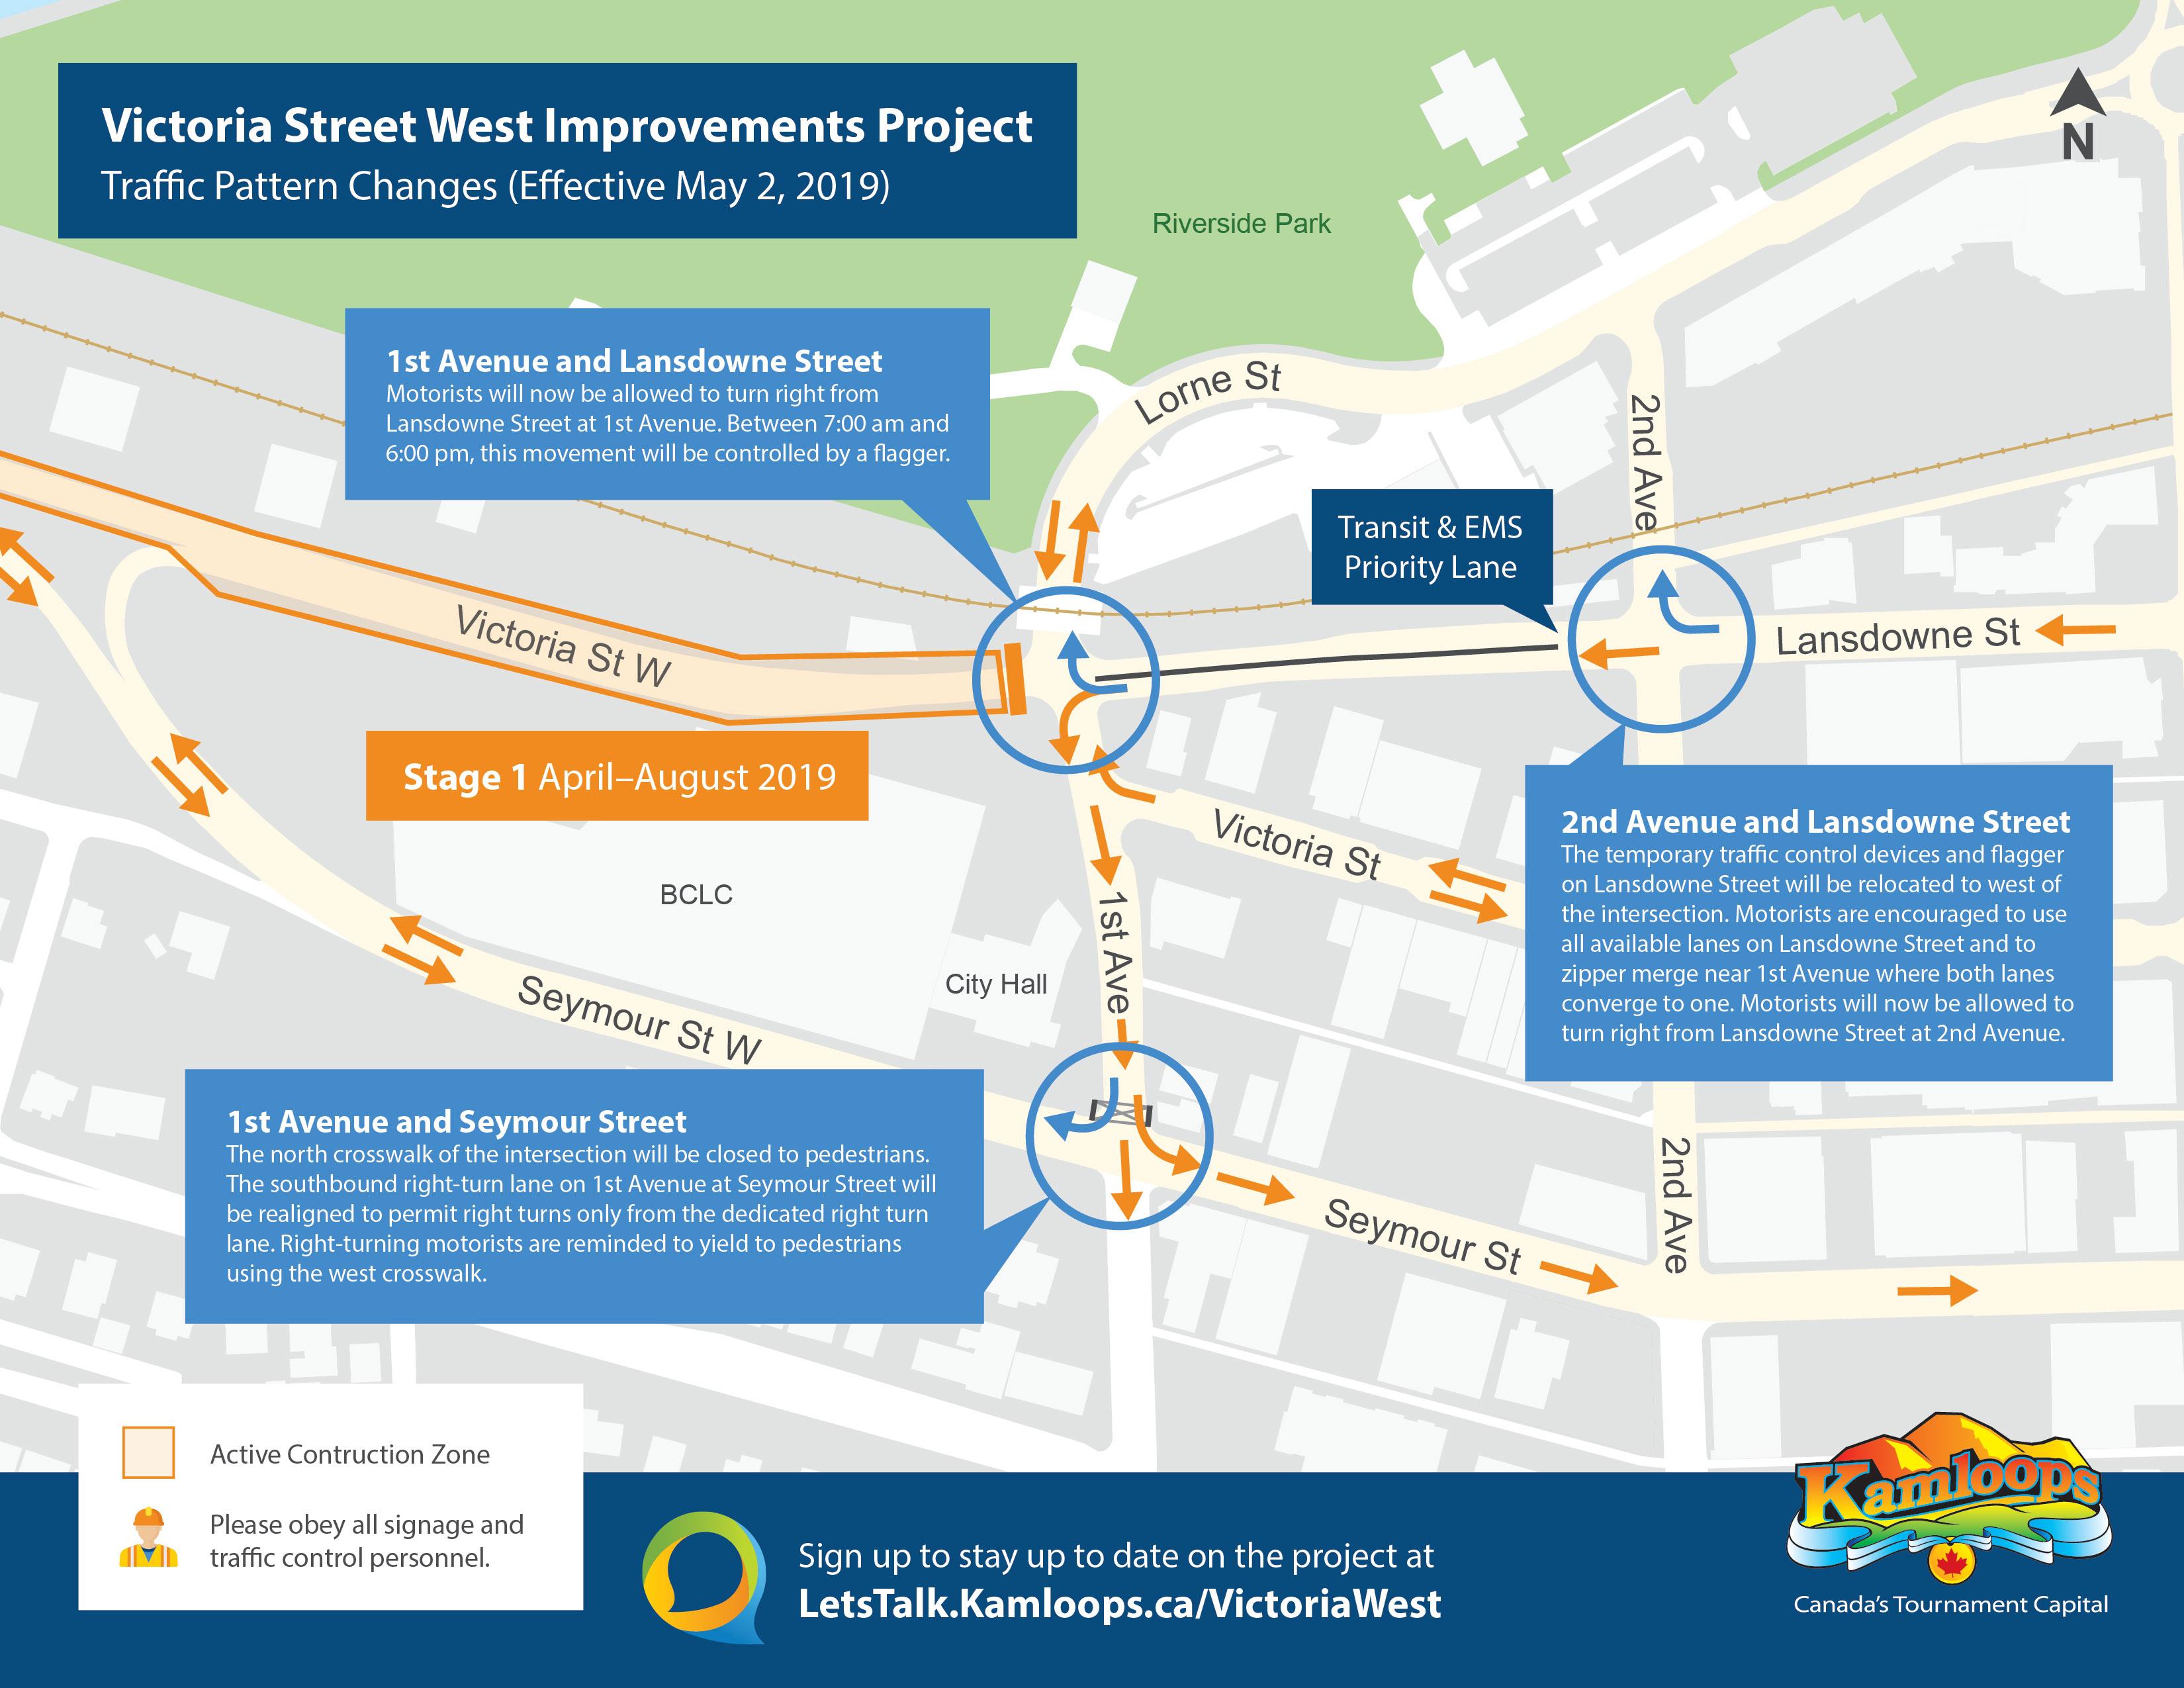 Victoria Street West Improvements Project | Let's Talk Kamloops